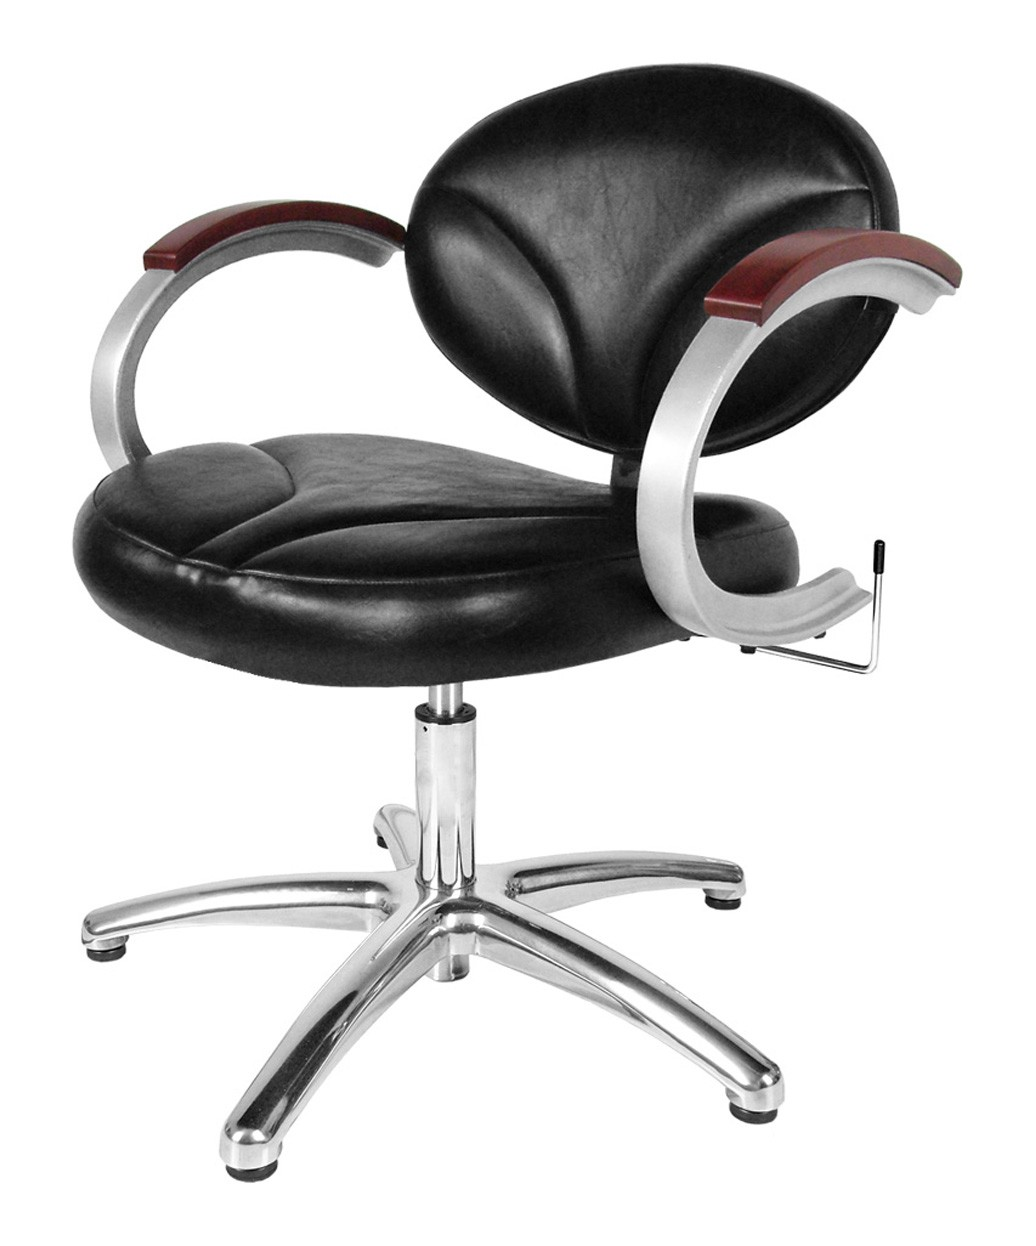 Collins 9130L Silhouette Lever-Control Shampoo Chair